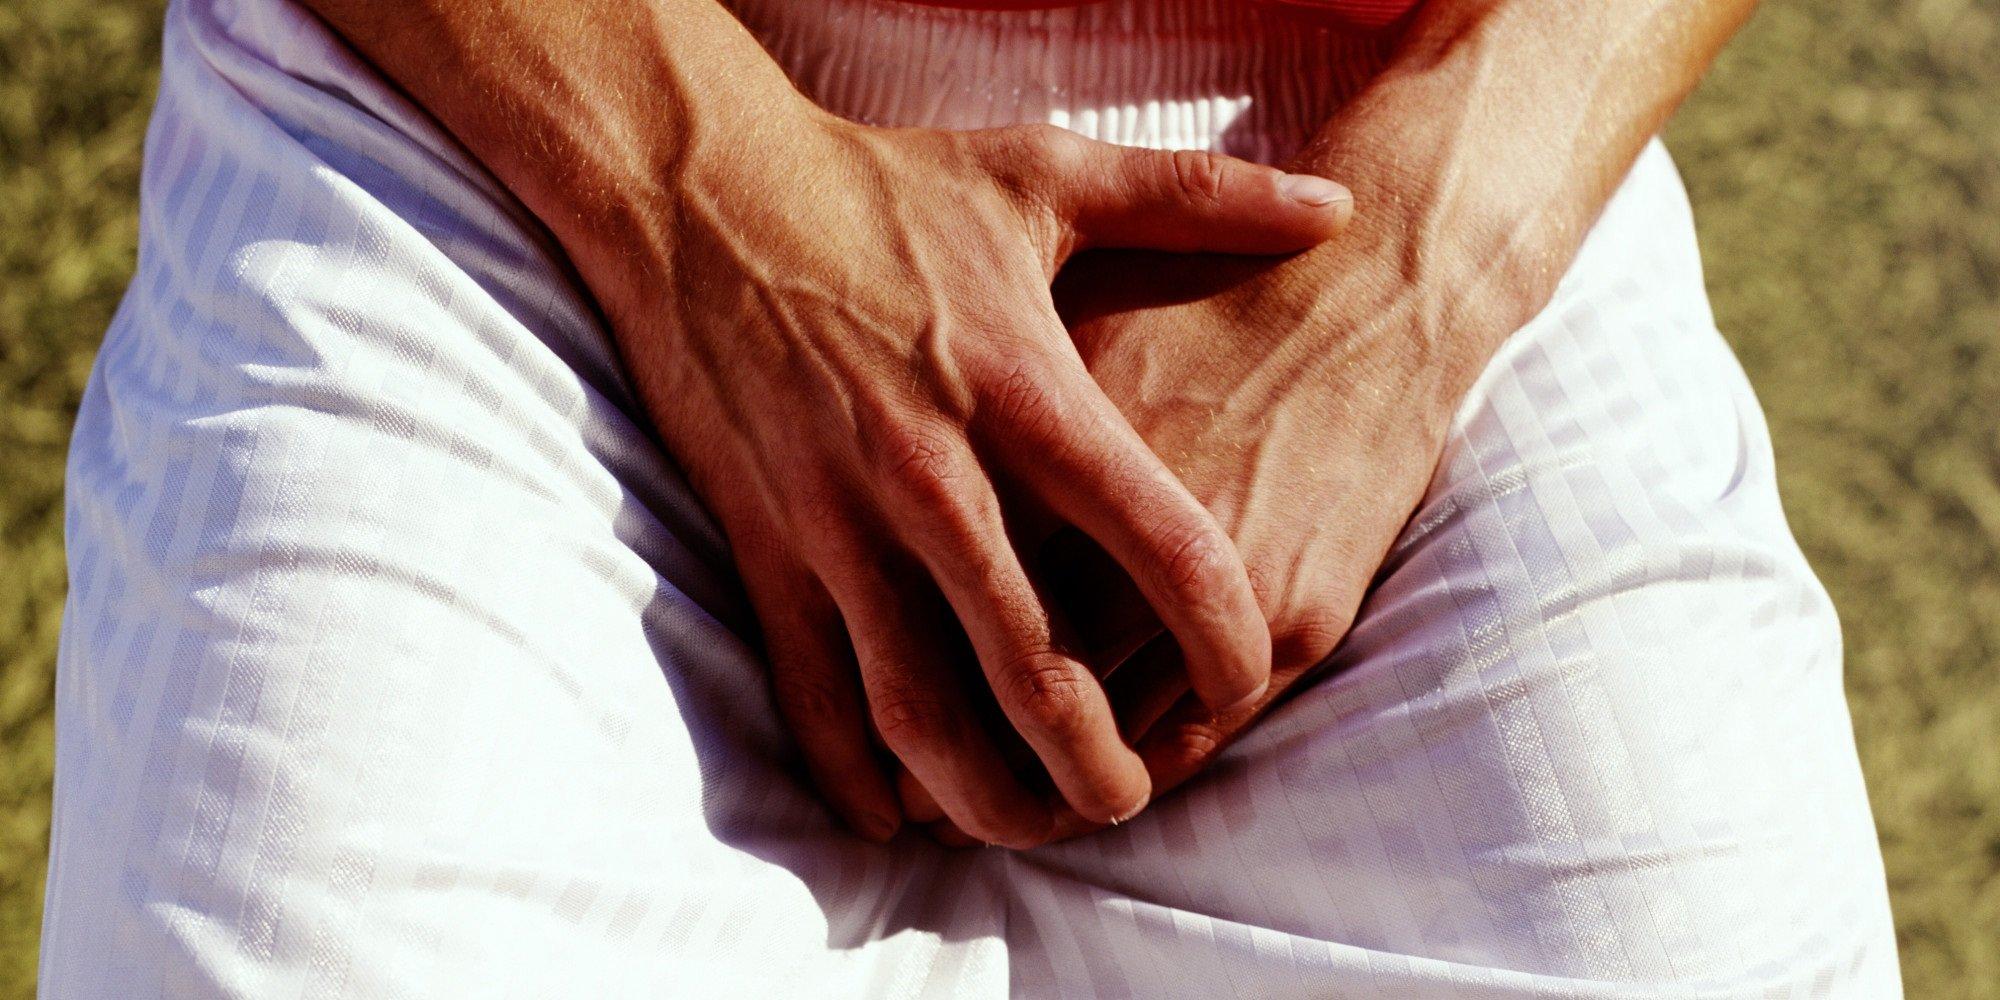 Гарднерелла у мужчин - симптомы и лечение гарднереллы у мужчин